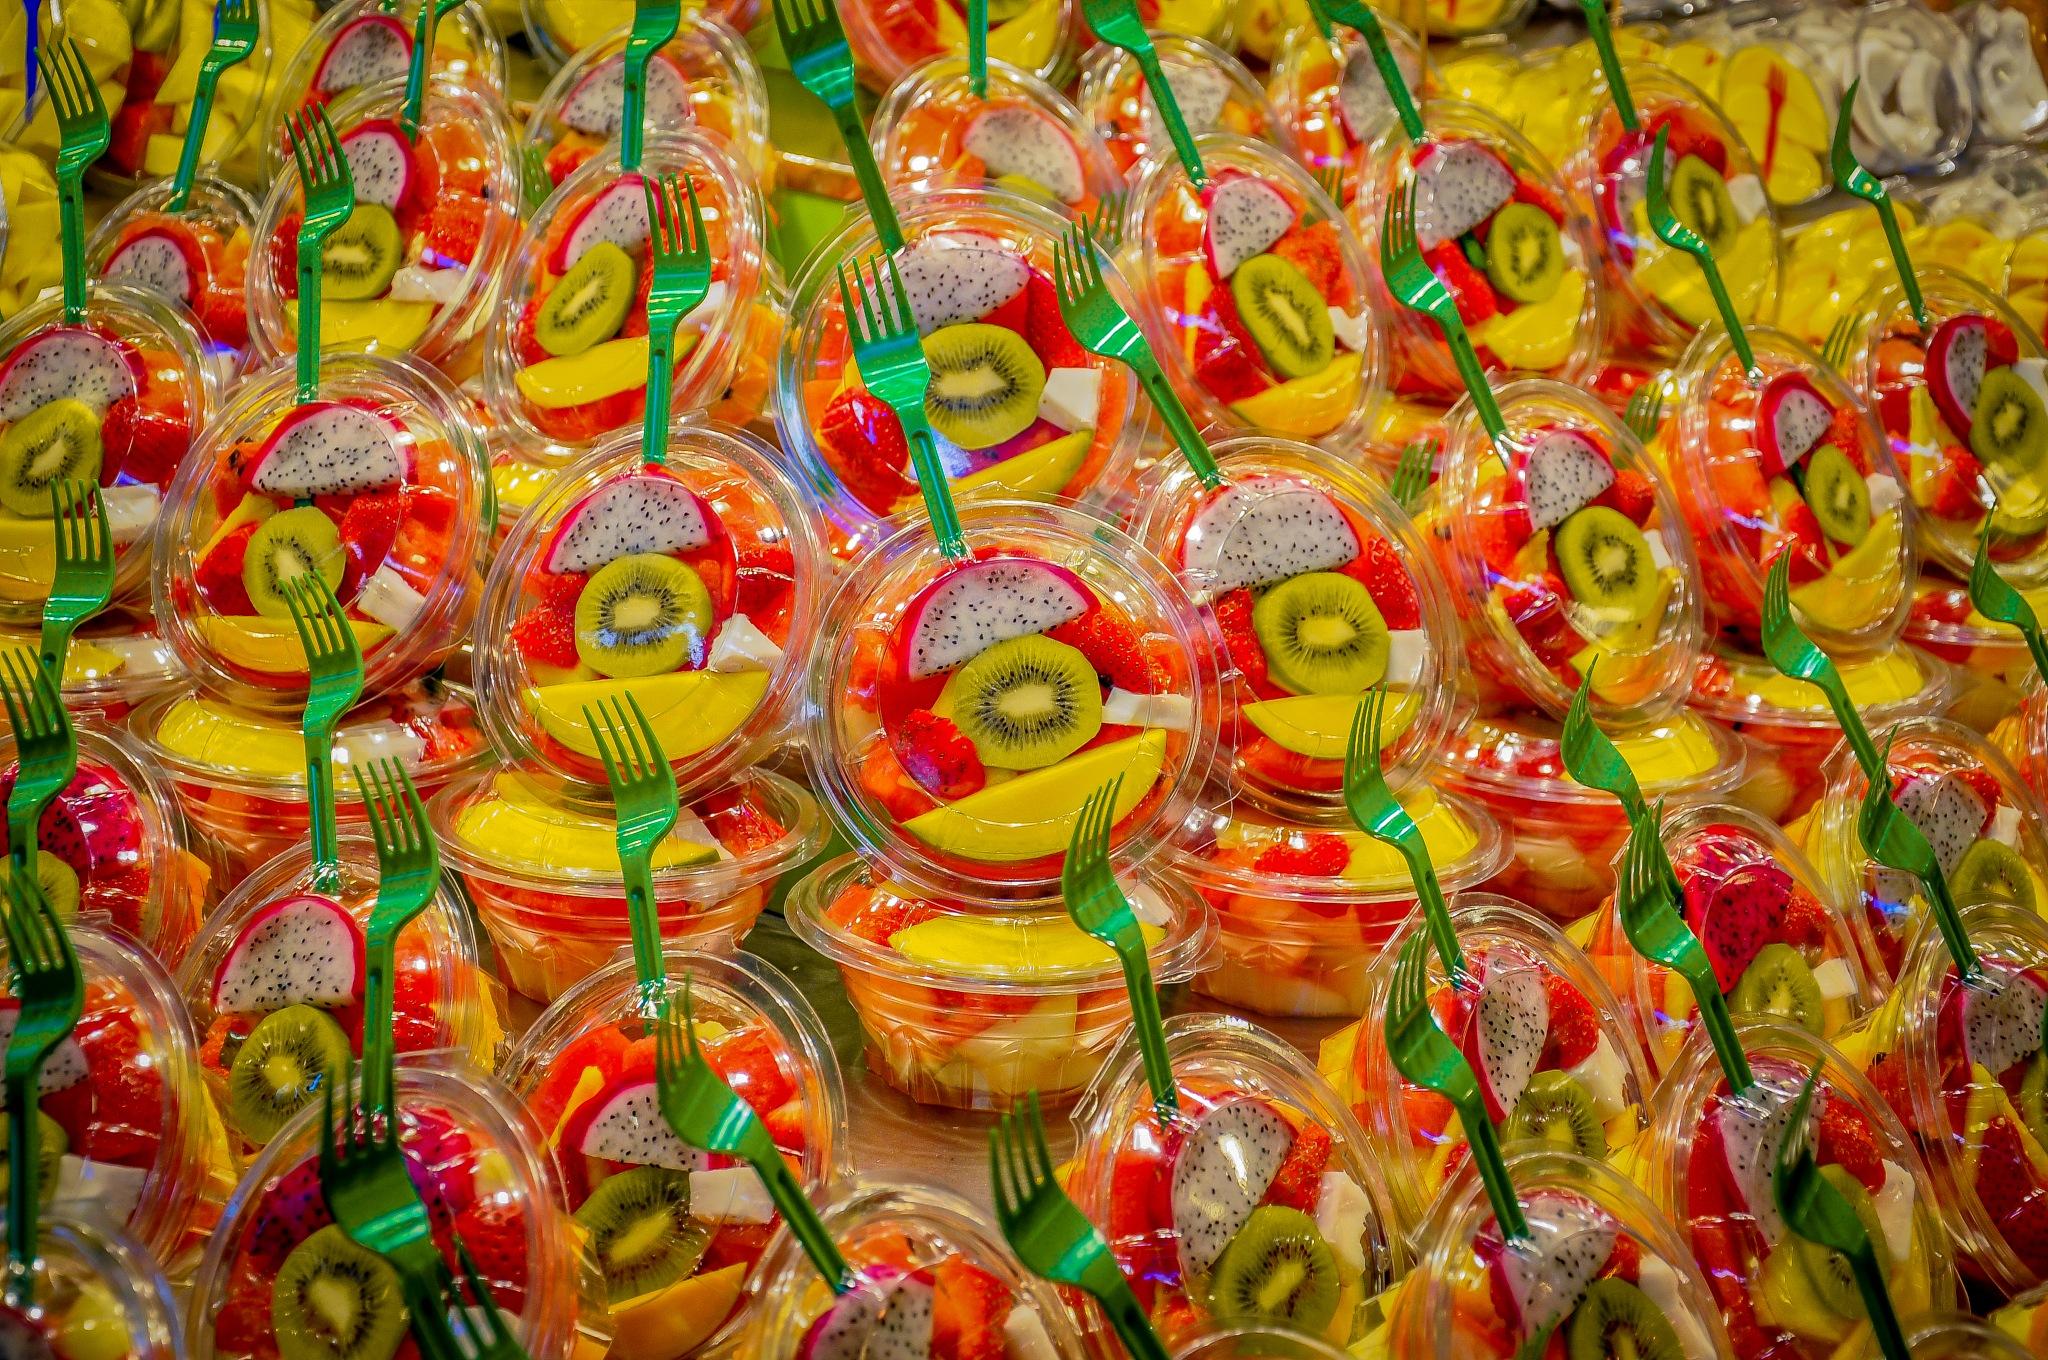 Fruits by Christian Hofmann